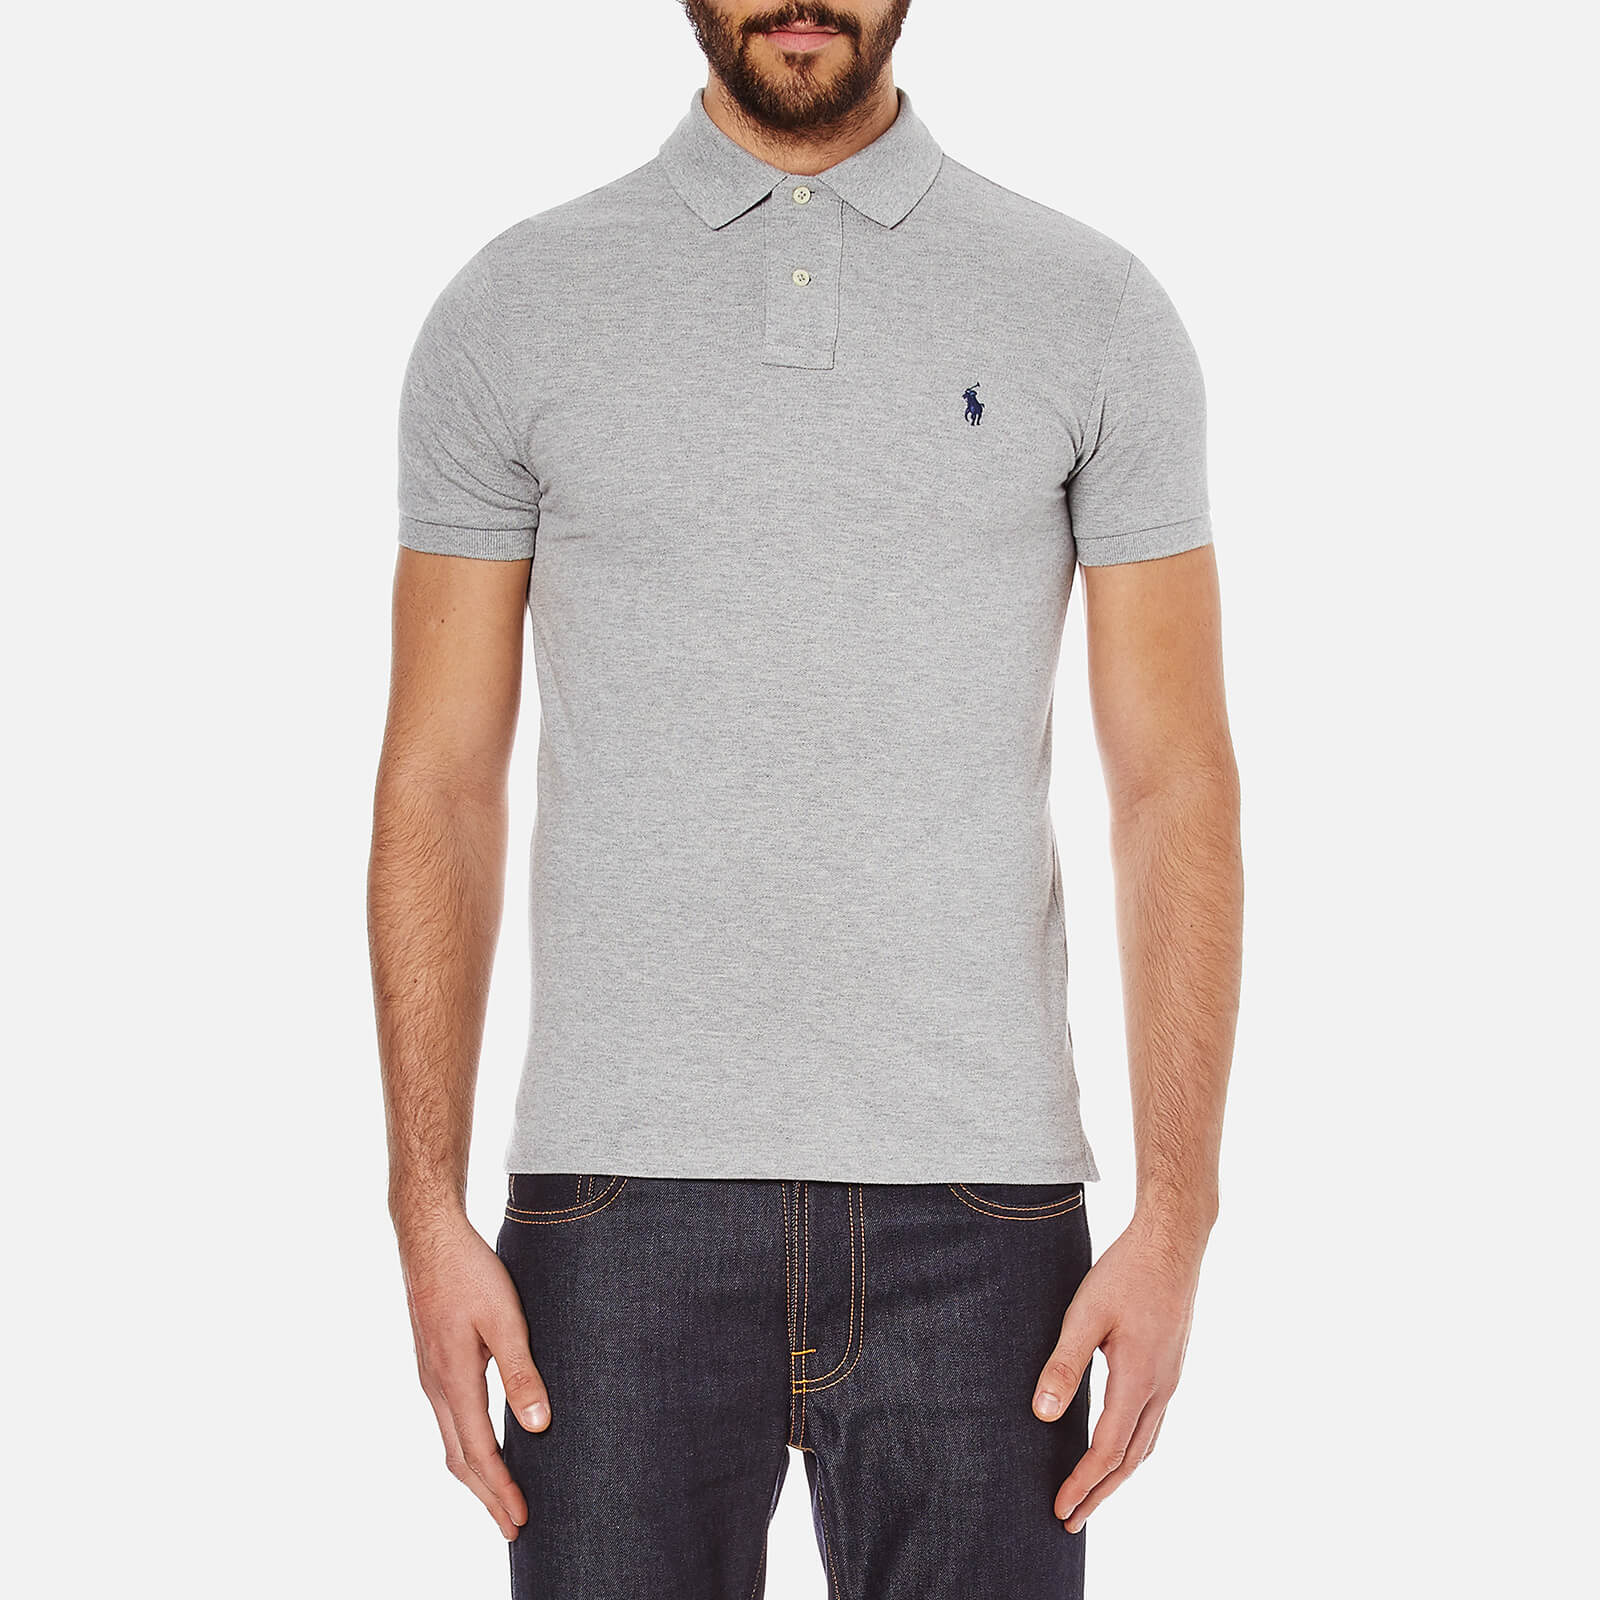 Polo Ralph Lauren Men's Slim Fit Short Sleeved Polo Shirt - Andover Heather